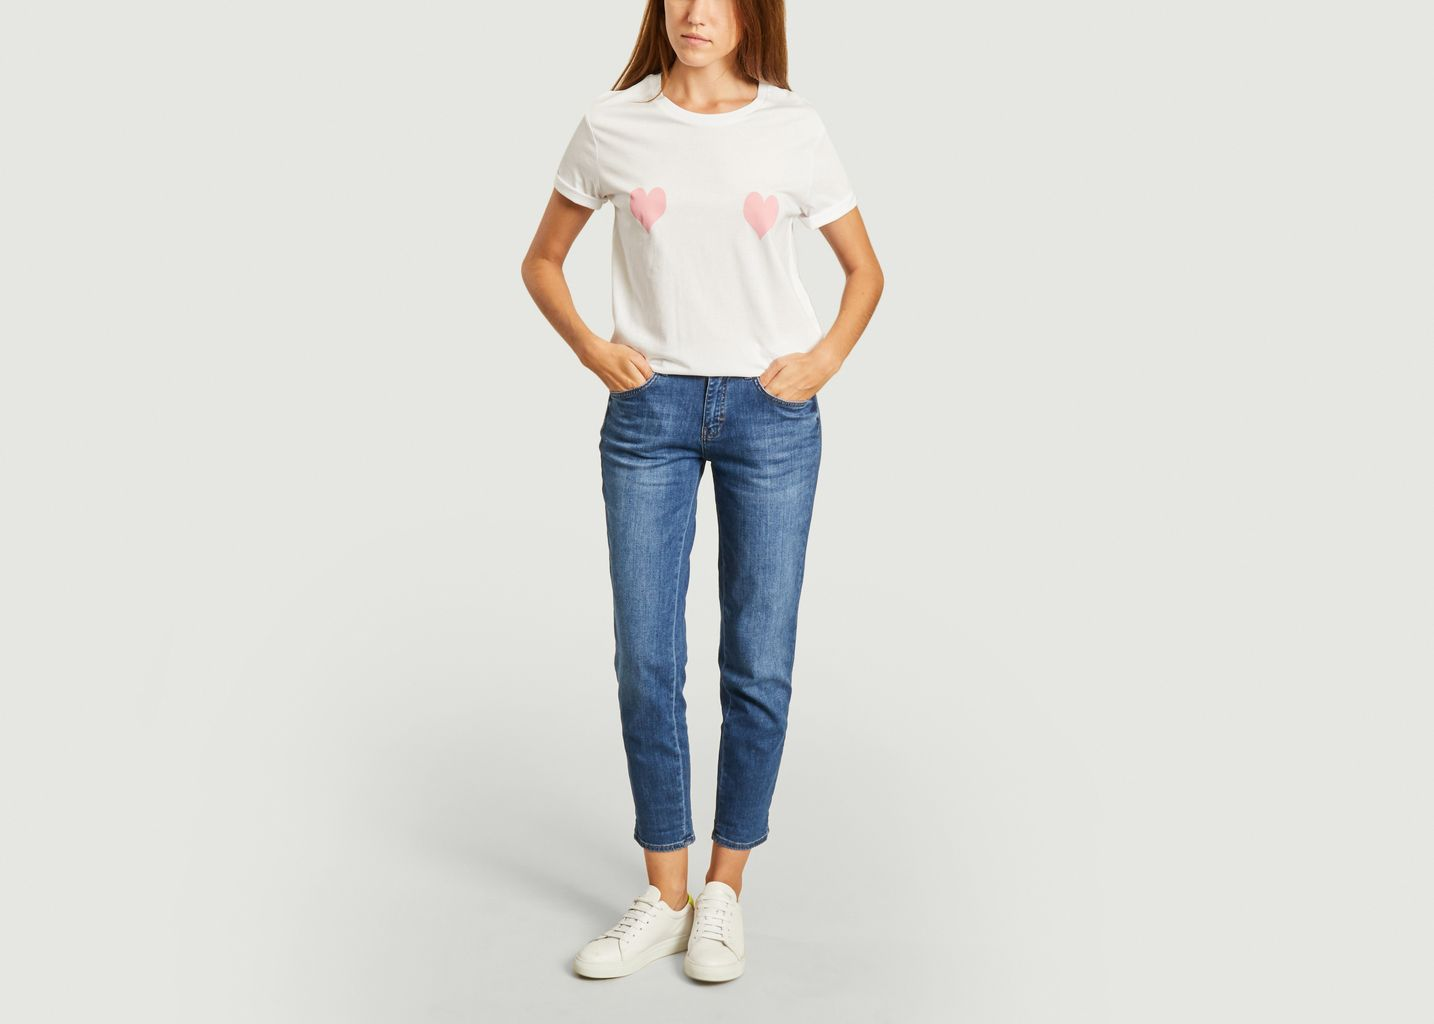 T-shirt coeurs roses  - Elise Chalmin